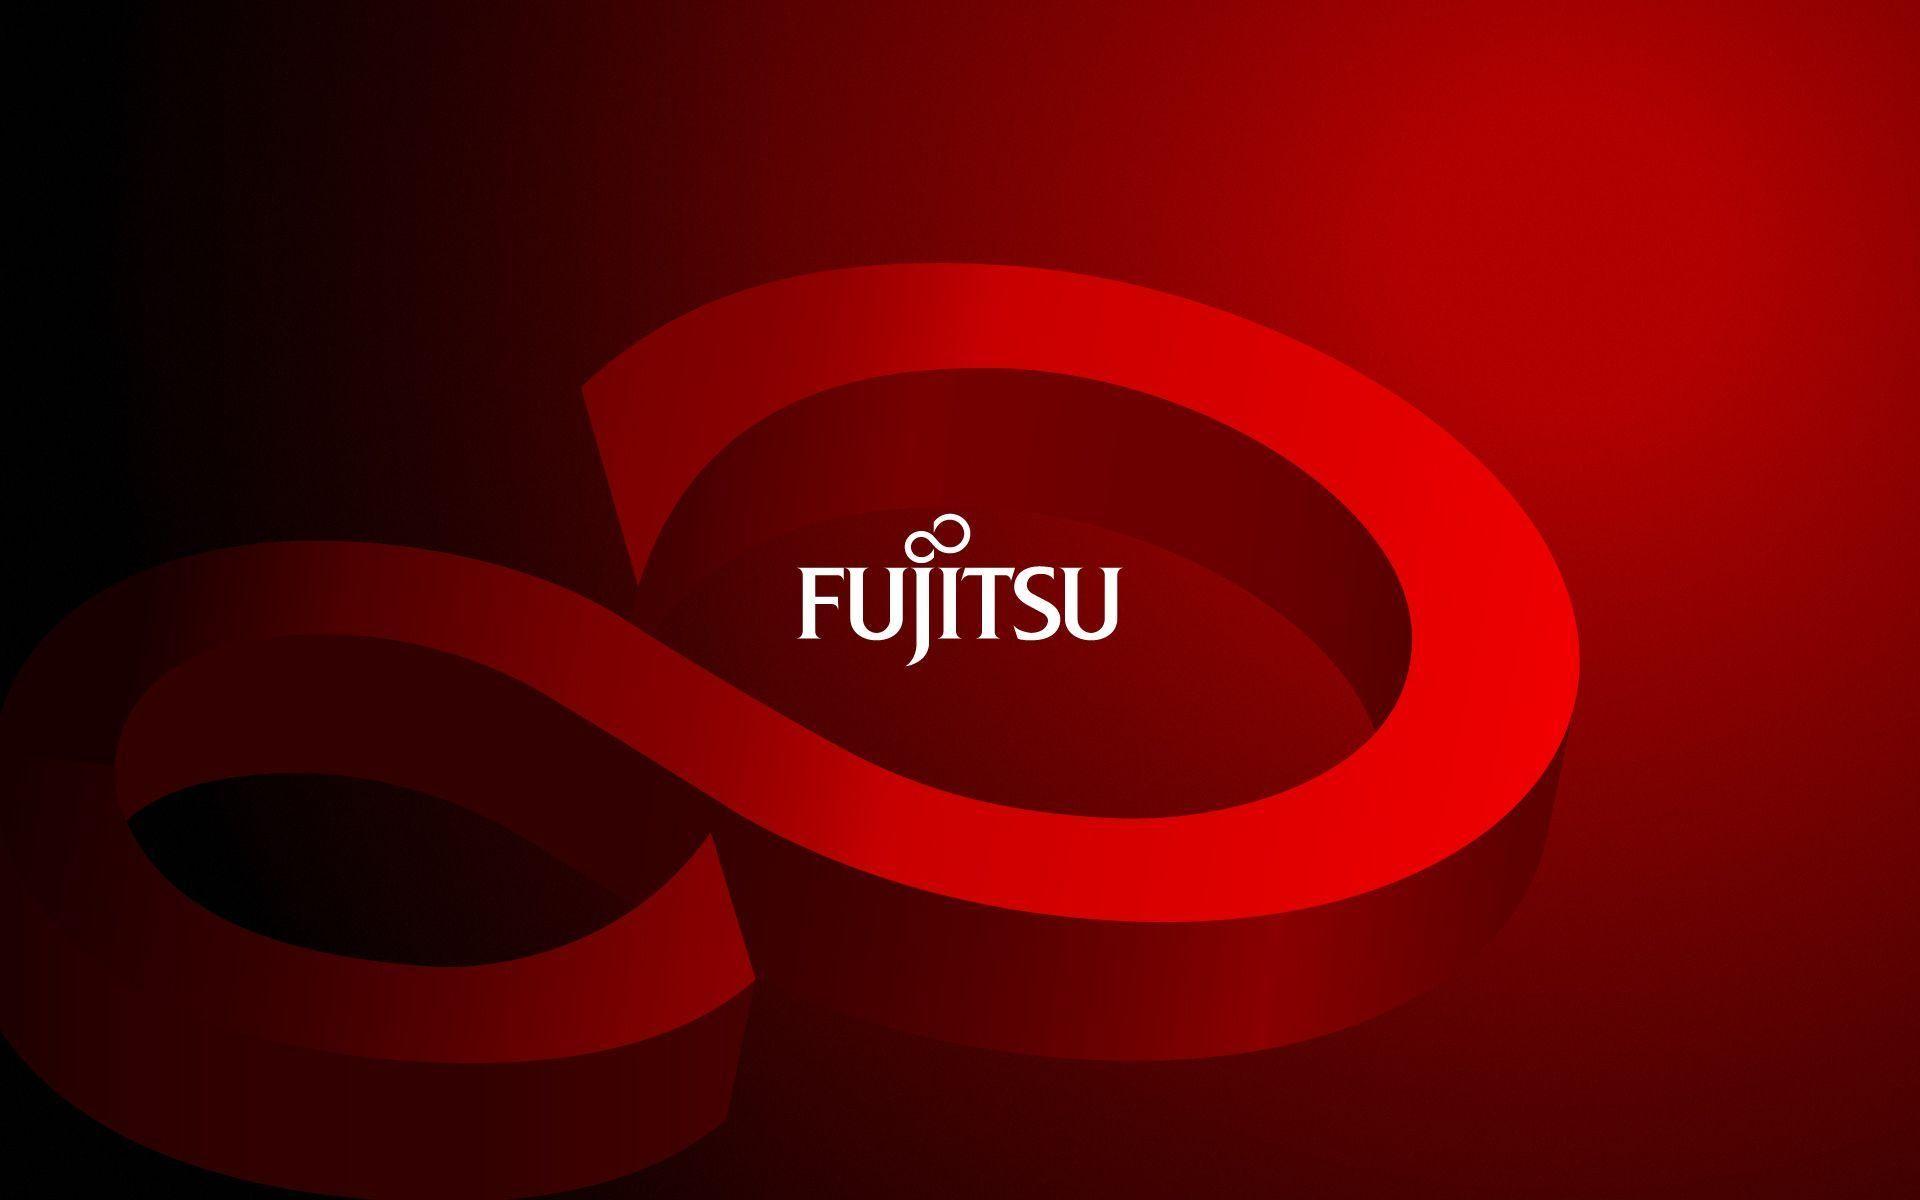 Best Wallpaper App Iphone 7 Fujitsu Wallpapers Hd